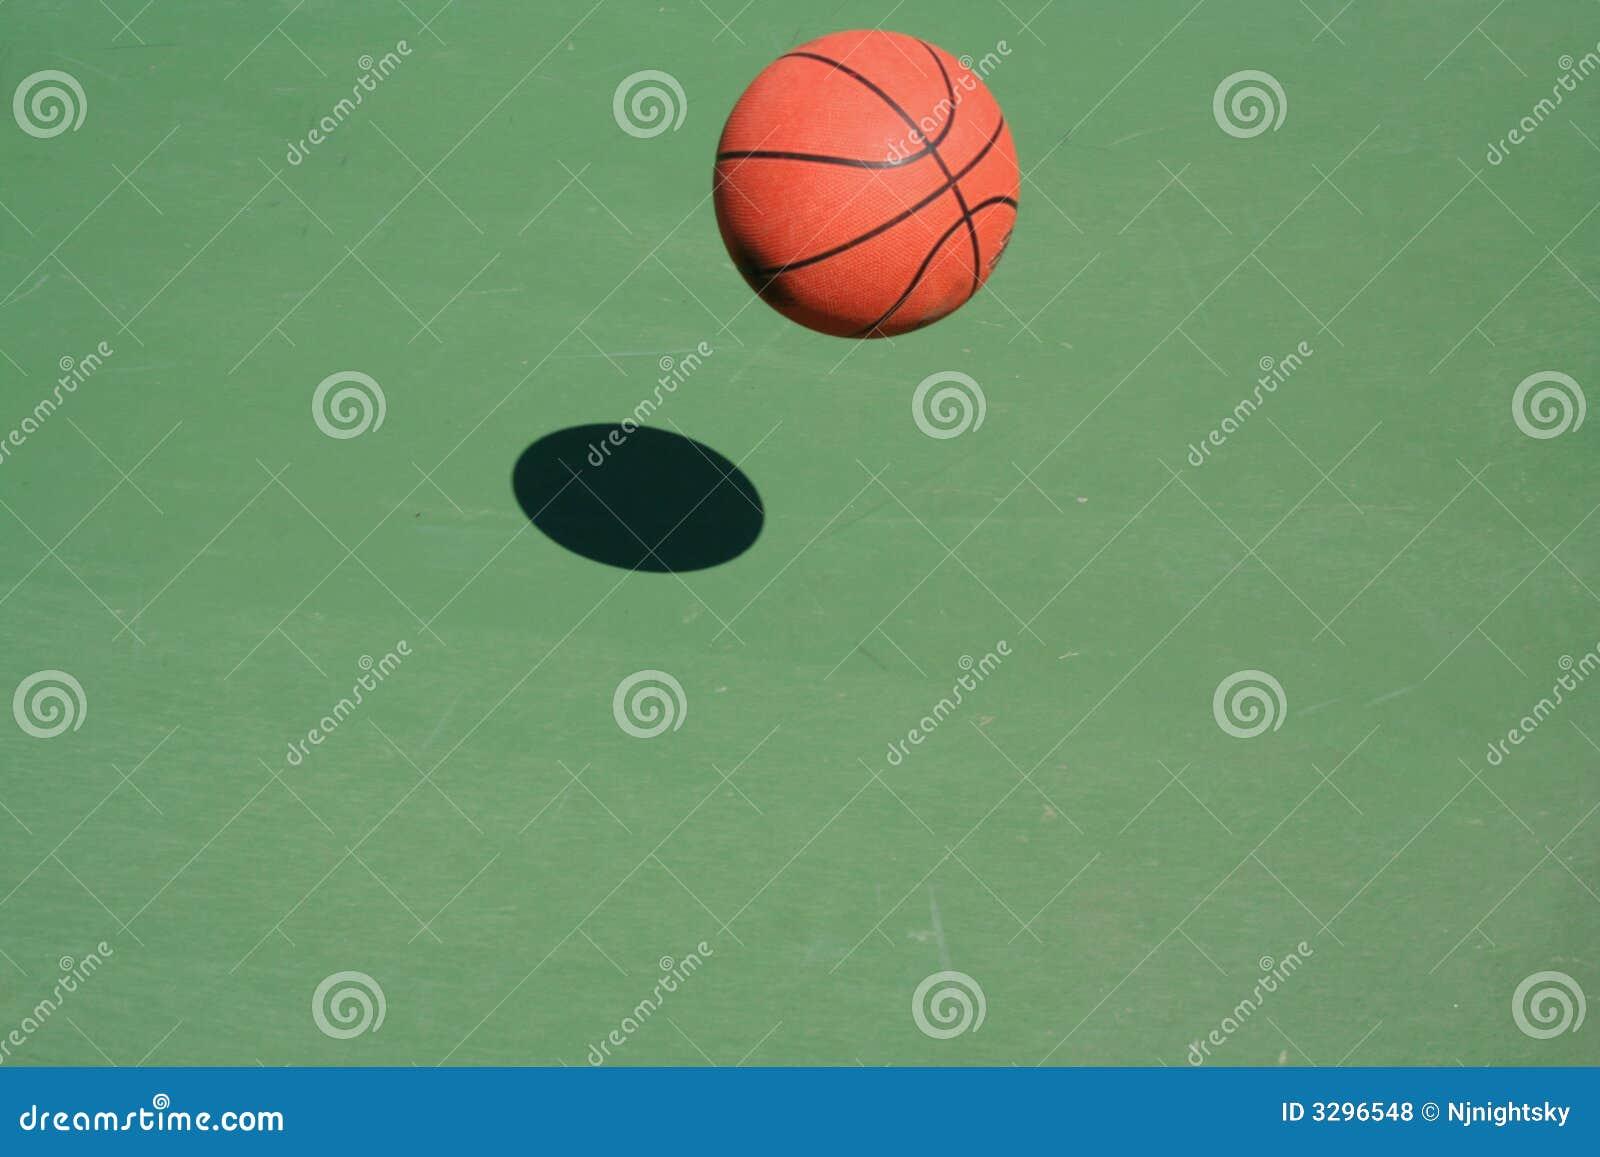 Saltando o basquetebol